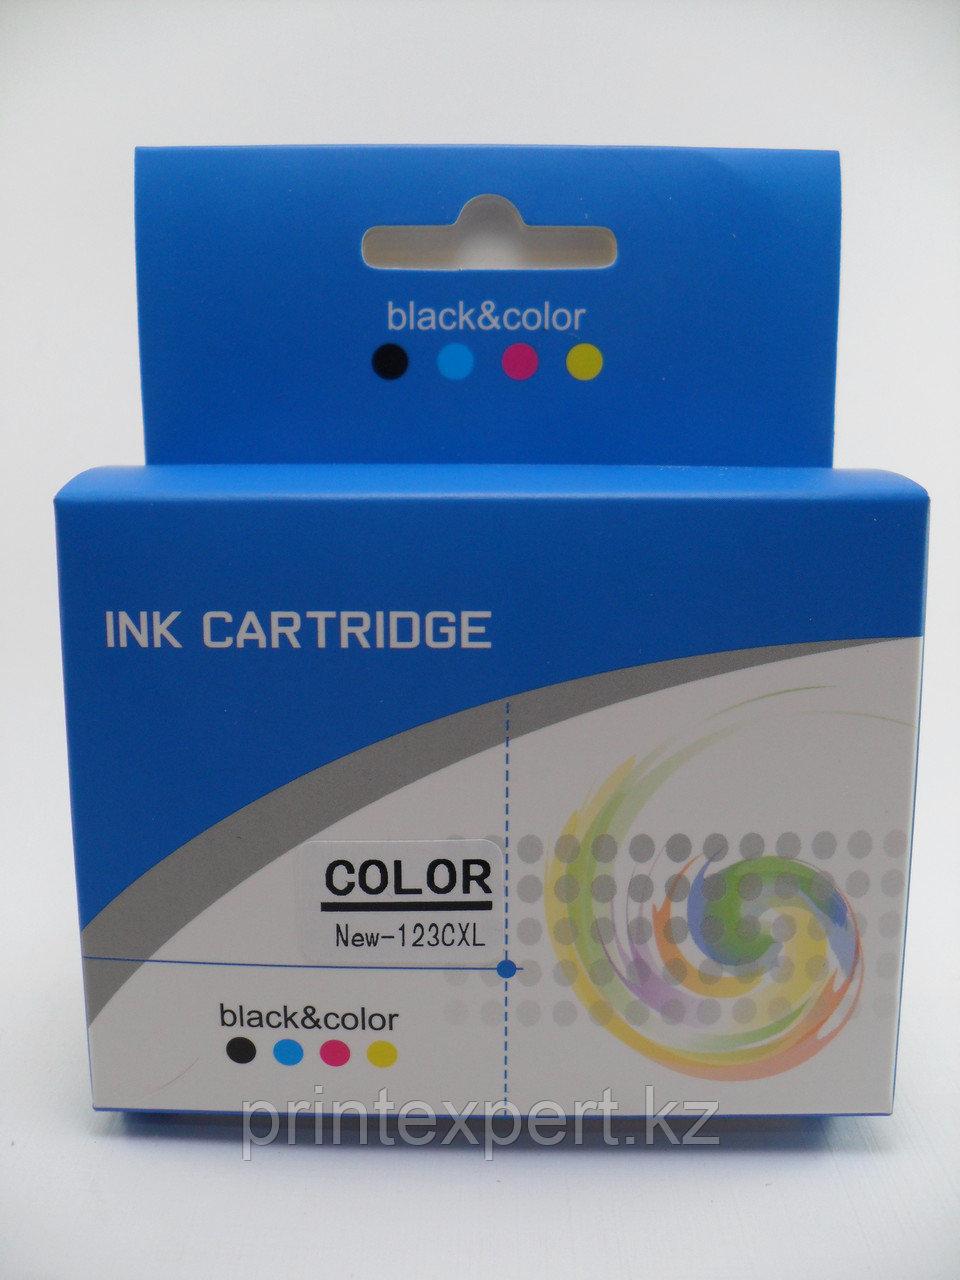 Картридж HP 123XL color